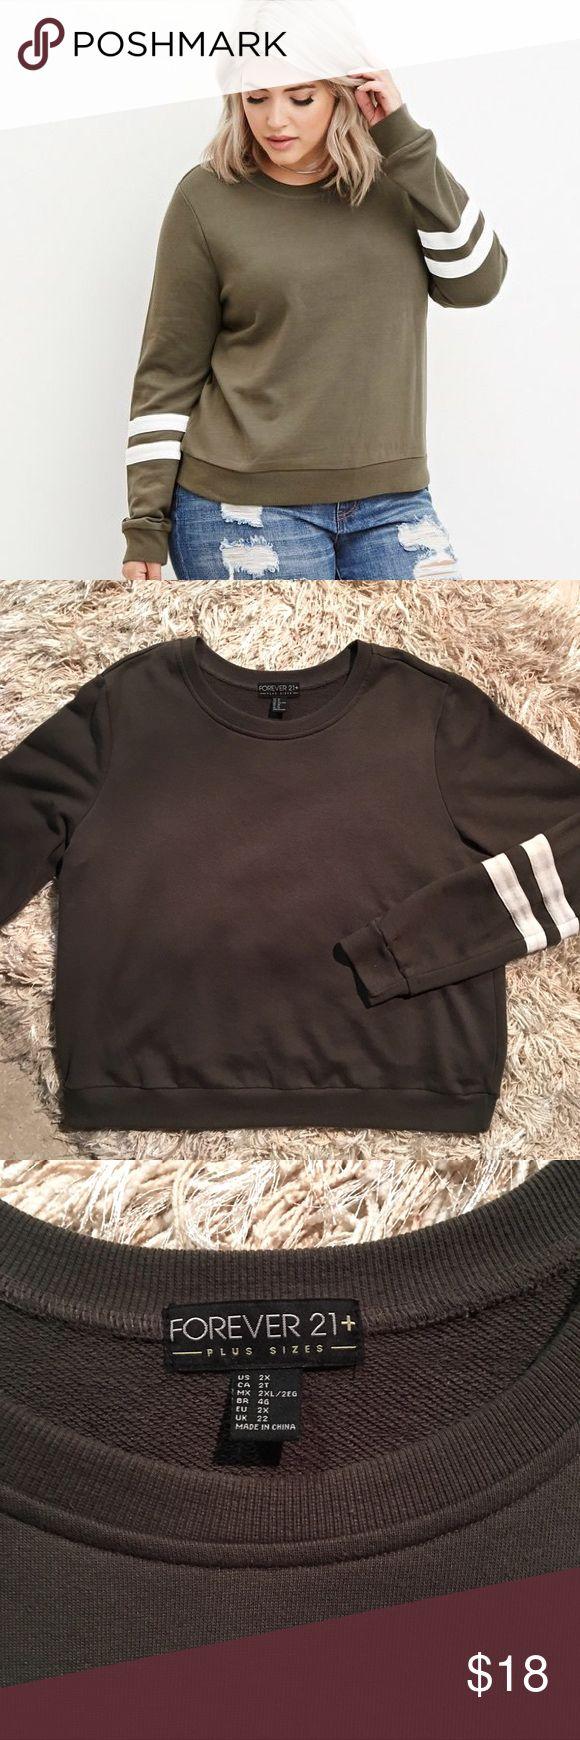 Forever 21 Varsity Striped Sweatshirt Forever 21 Plus Varsity Striped Sweatshirt. Size 2x. Excellent condition. Forever 21 Sweaters Crew & Scoop Necks